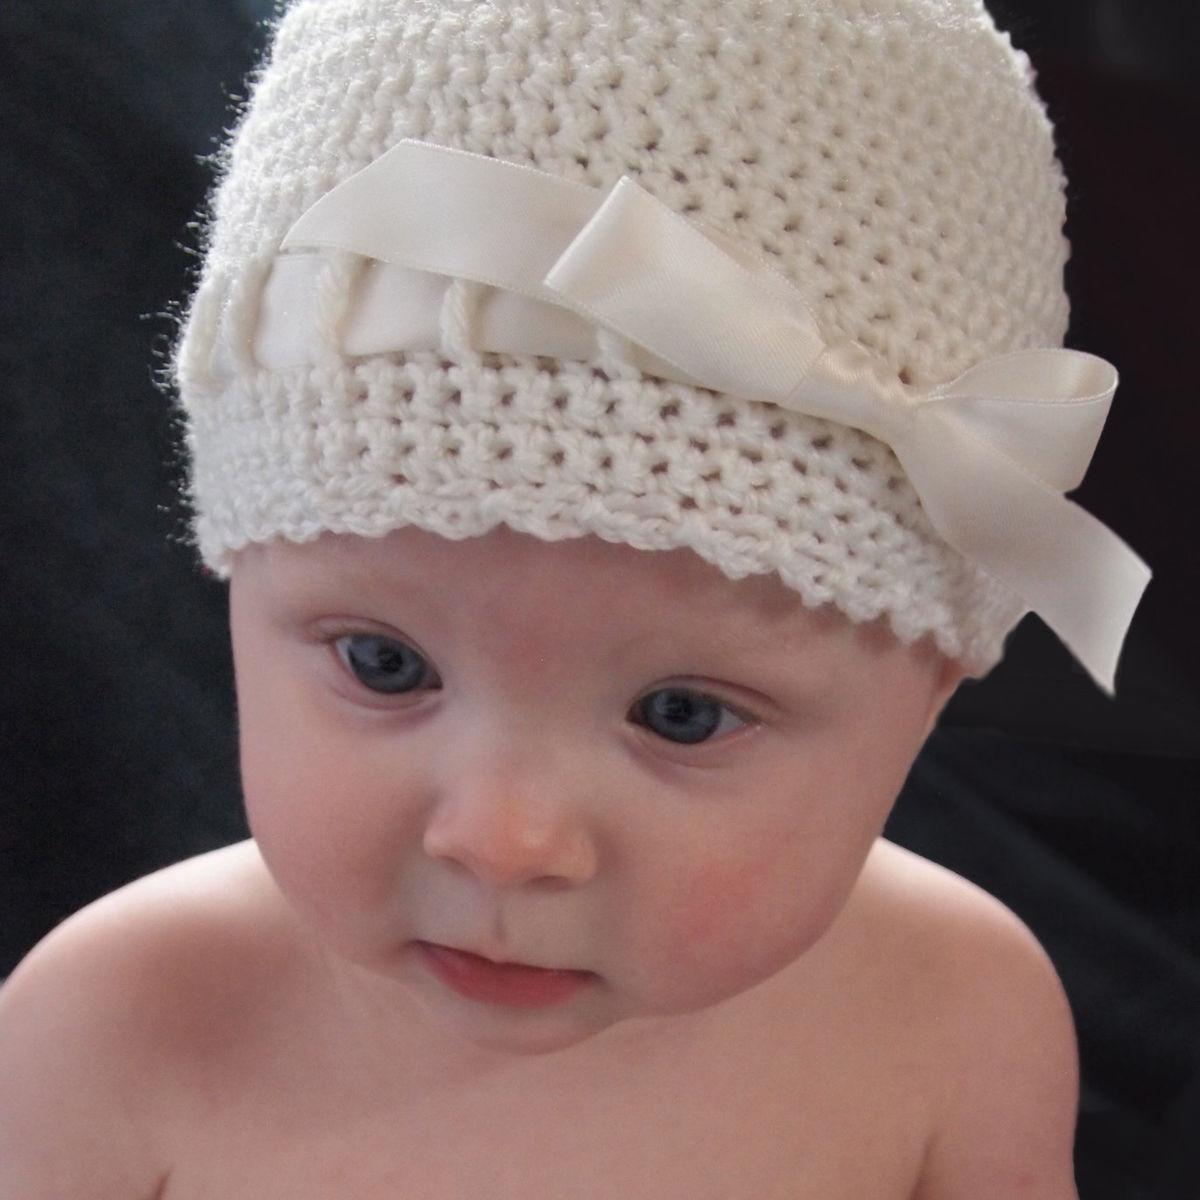 baby crochet hat, newborn ballerina hat, ivory - baby grace